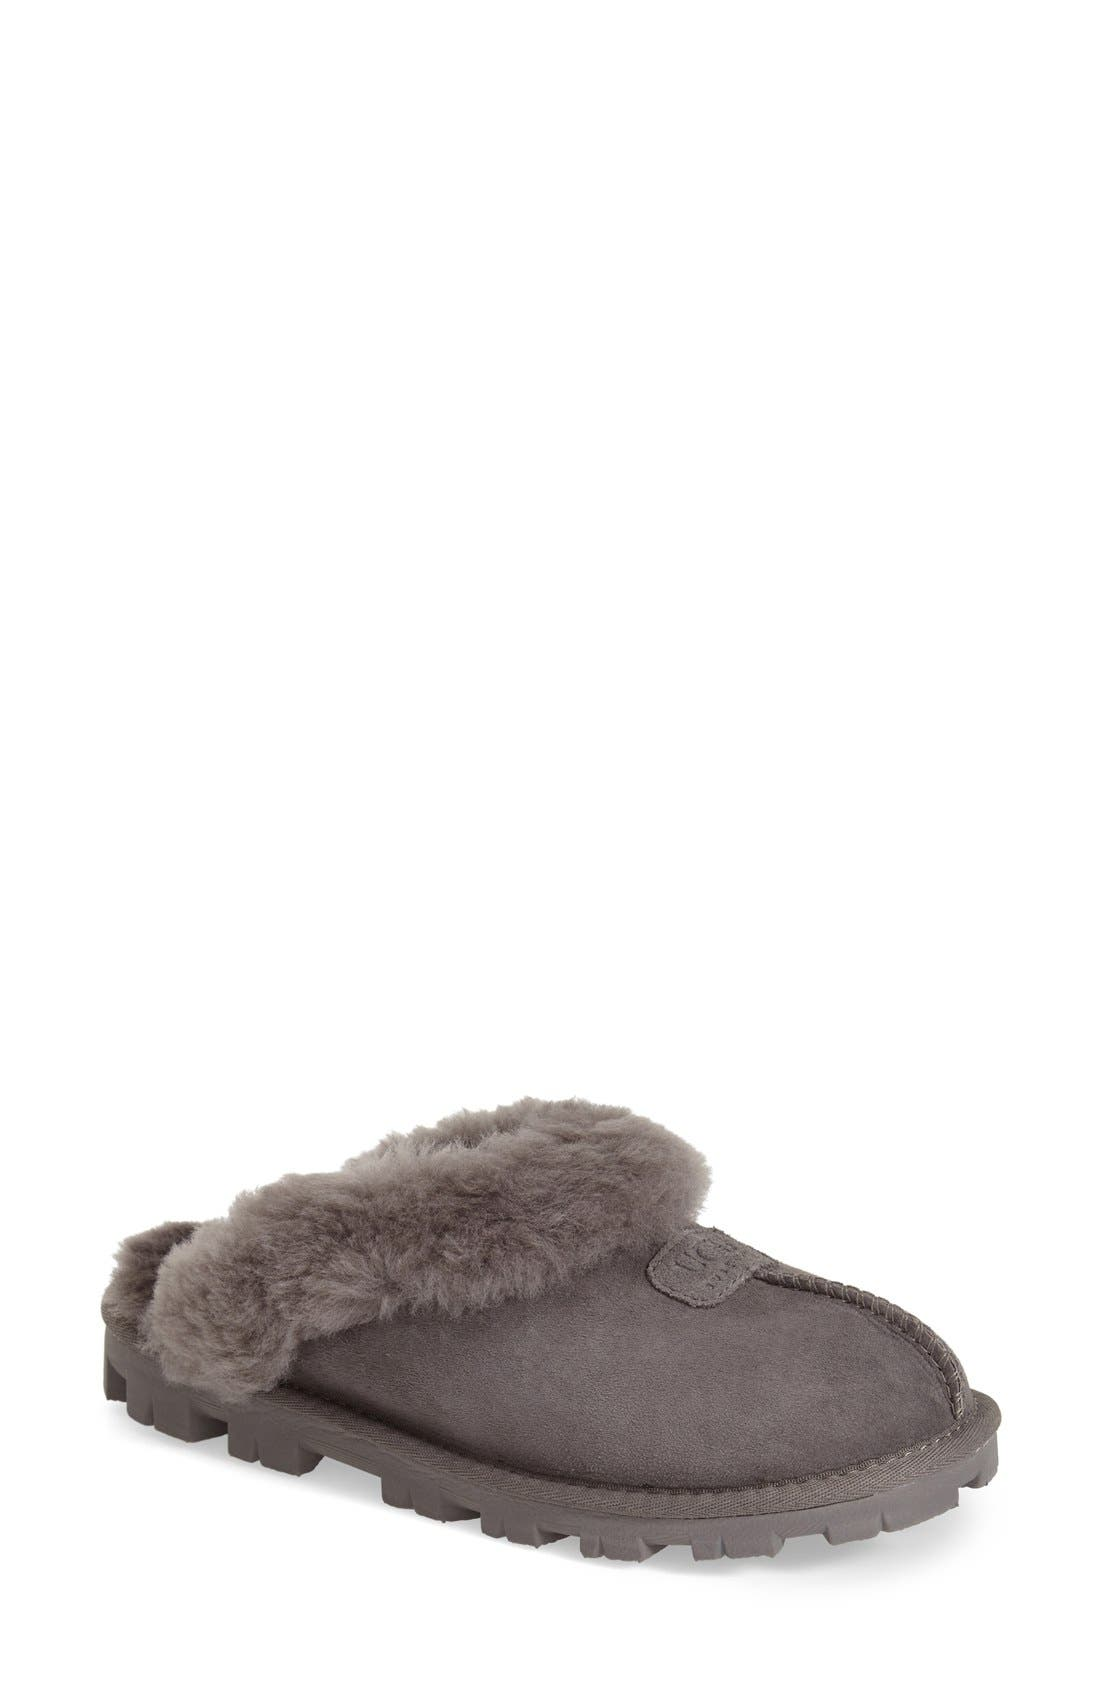 Ugg Genuine Shearling Slipper, Grey